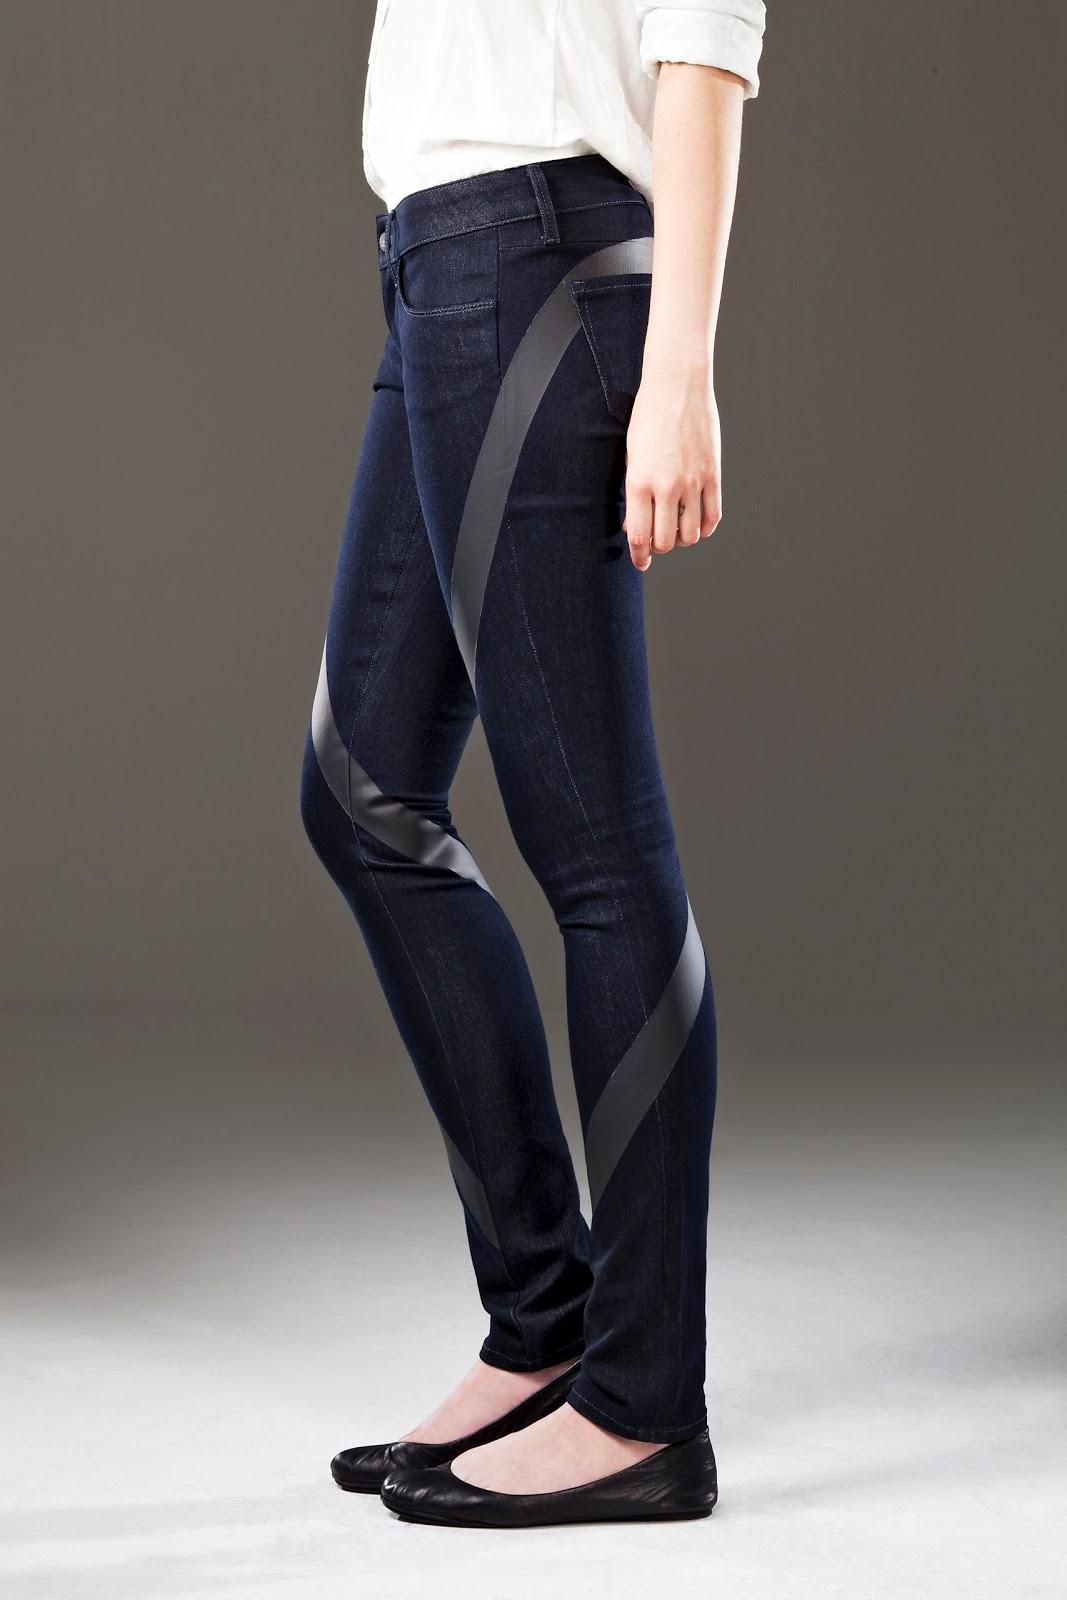 http://1.bp.blogspot.com/-Dc1qEP0kBDc/T9dN9qEetLI/AAAAAAAAHGk/I4pv5tdCHmg/s1600/chalayan+mavi+jeans+2013.JPG